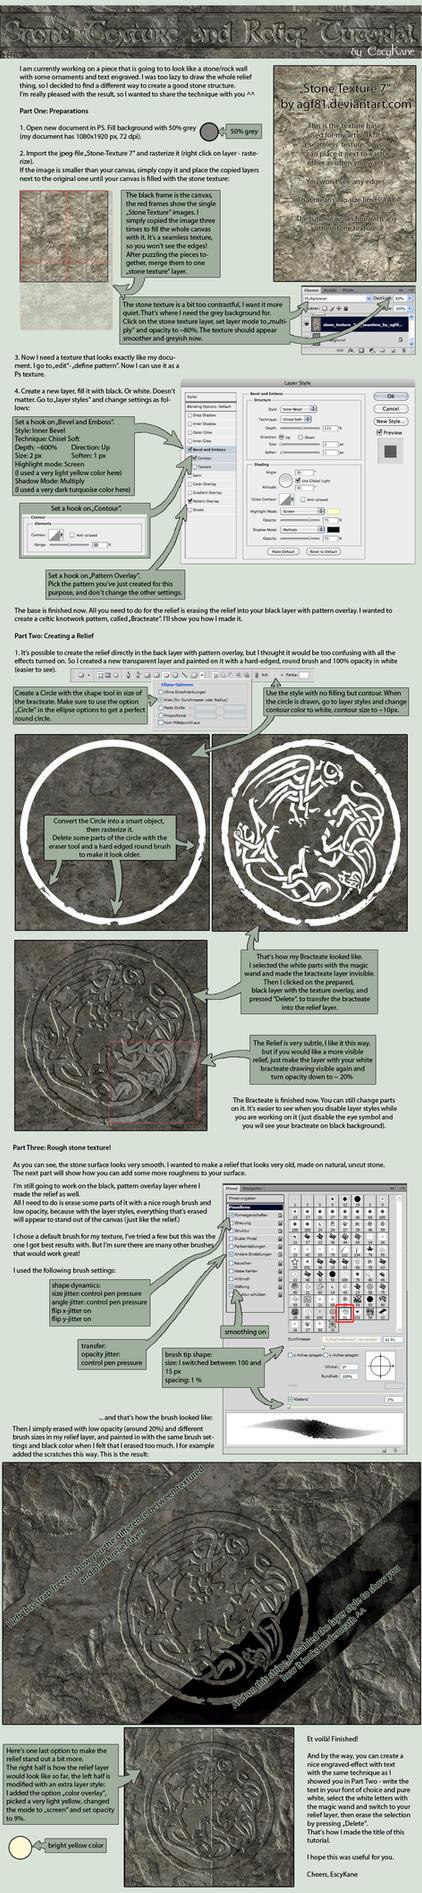 Stone Texture Relief Tutorial by EscyKane